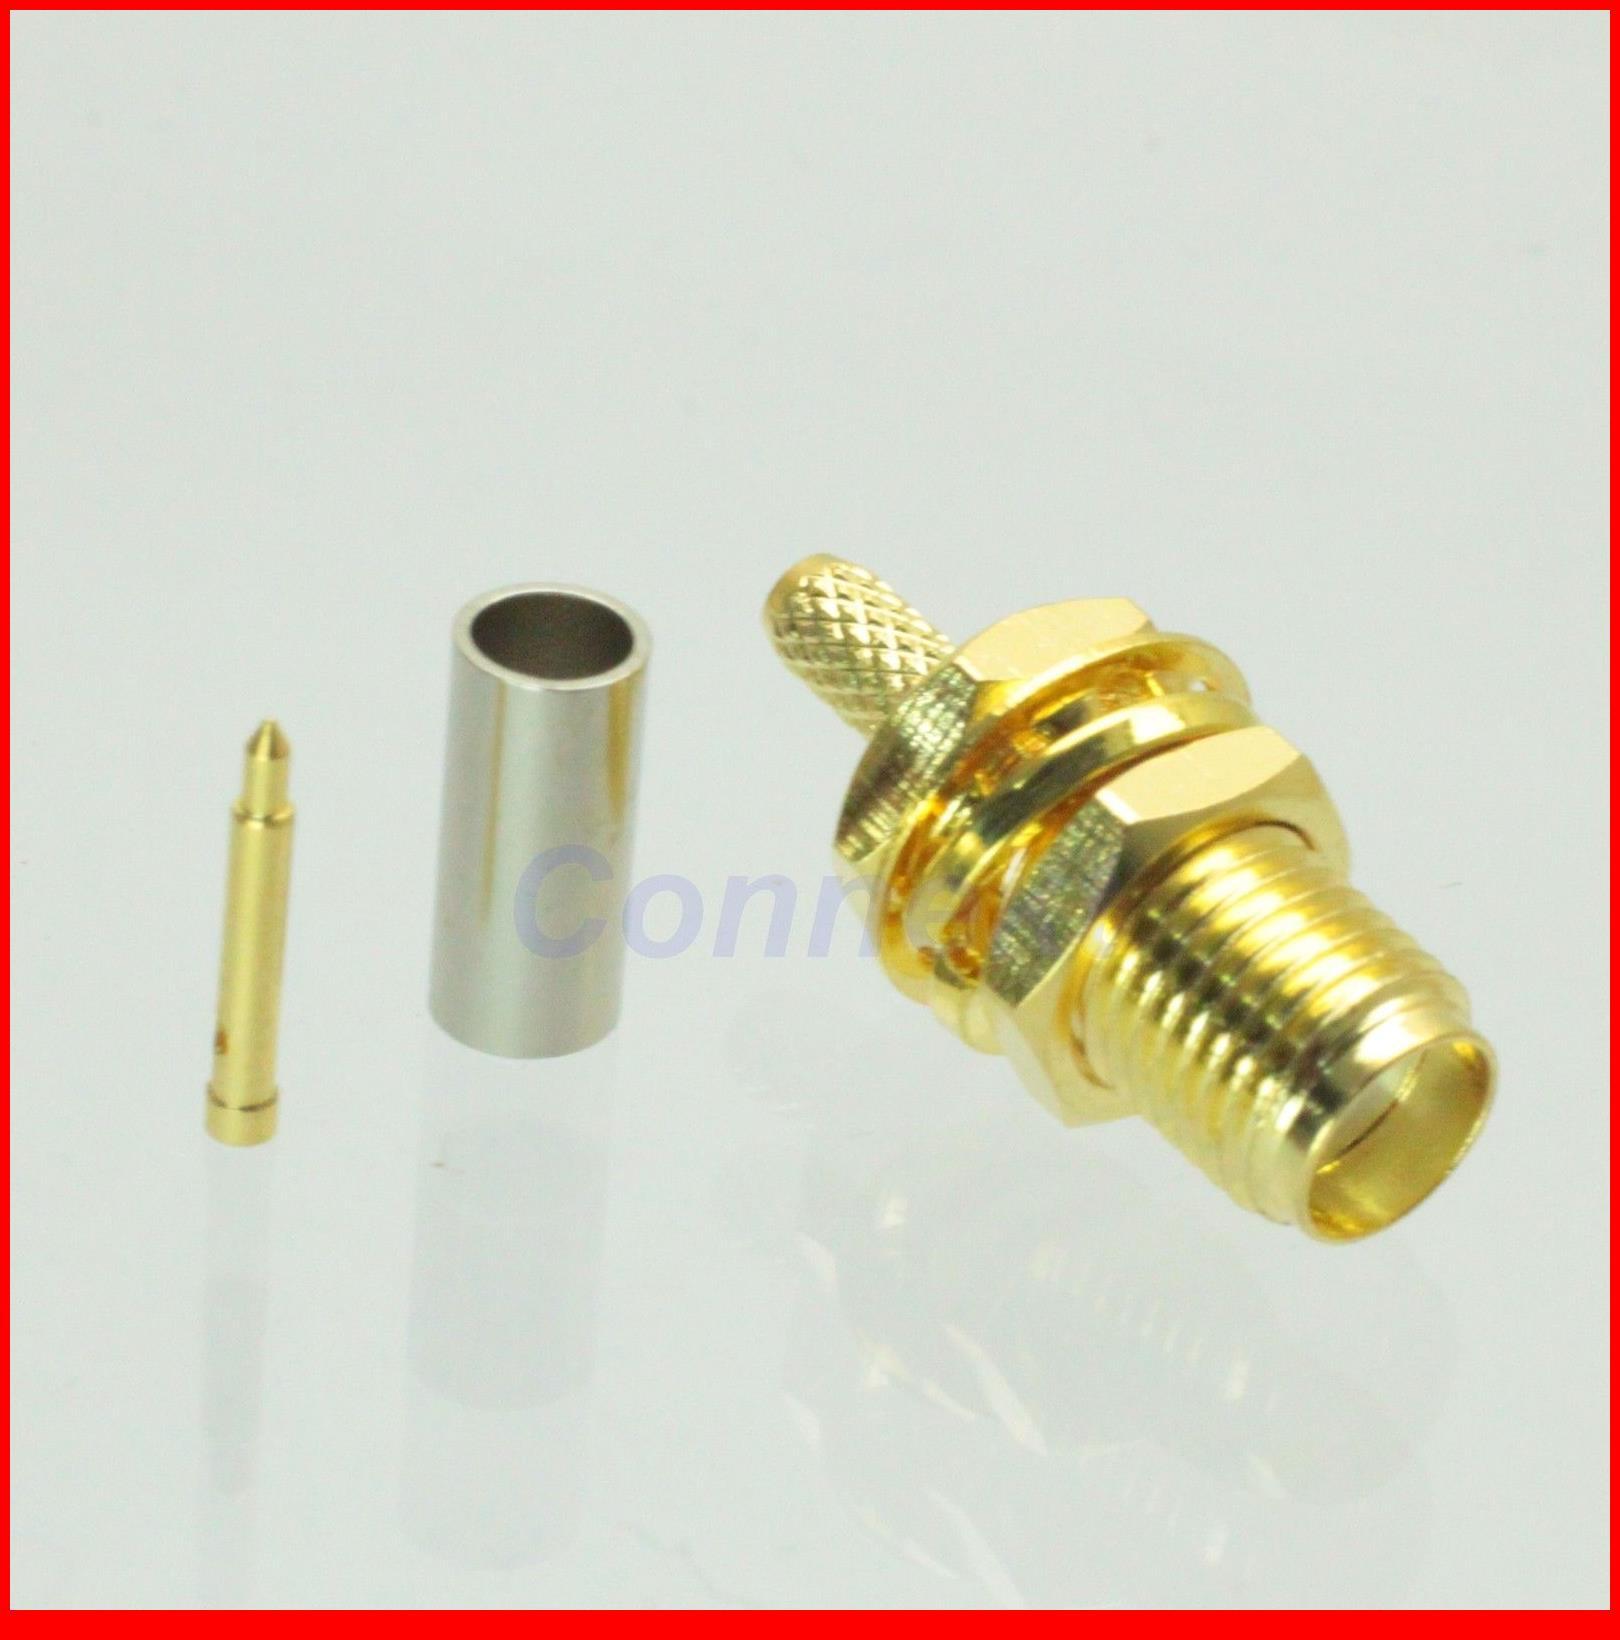 50pcs/lot  RP-SMA female plug center nut bulkhead crimp RG174 RG316 LMR100 RF connector<br><br>Aliexpress